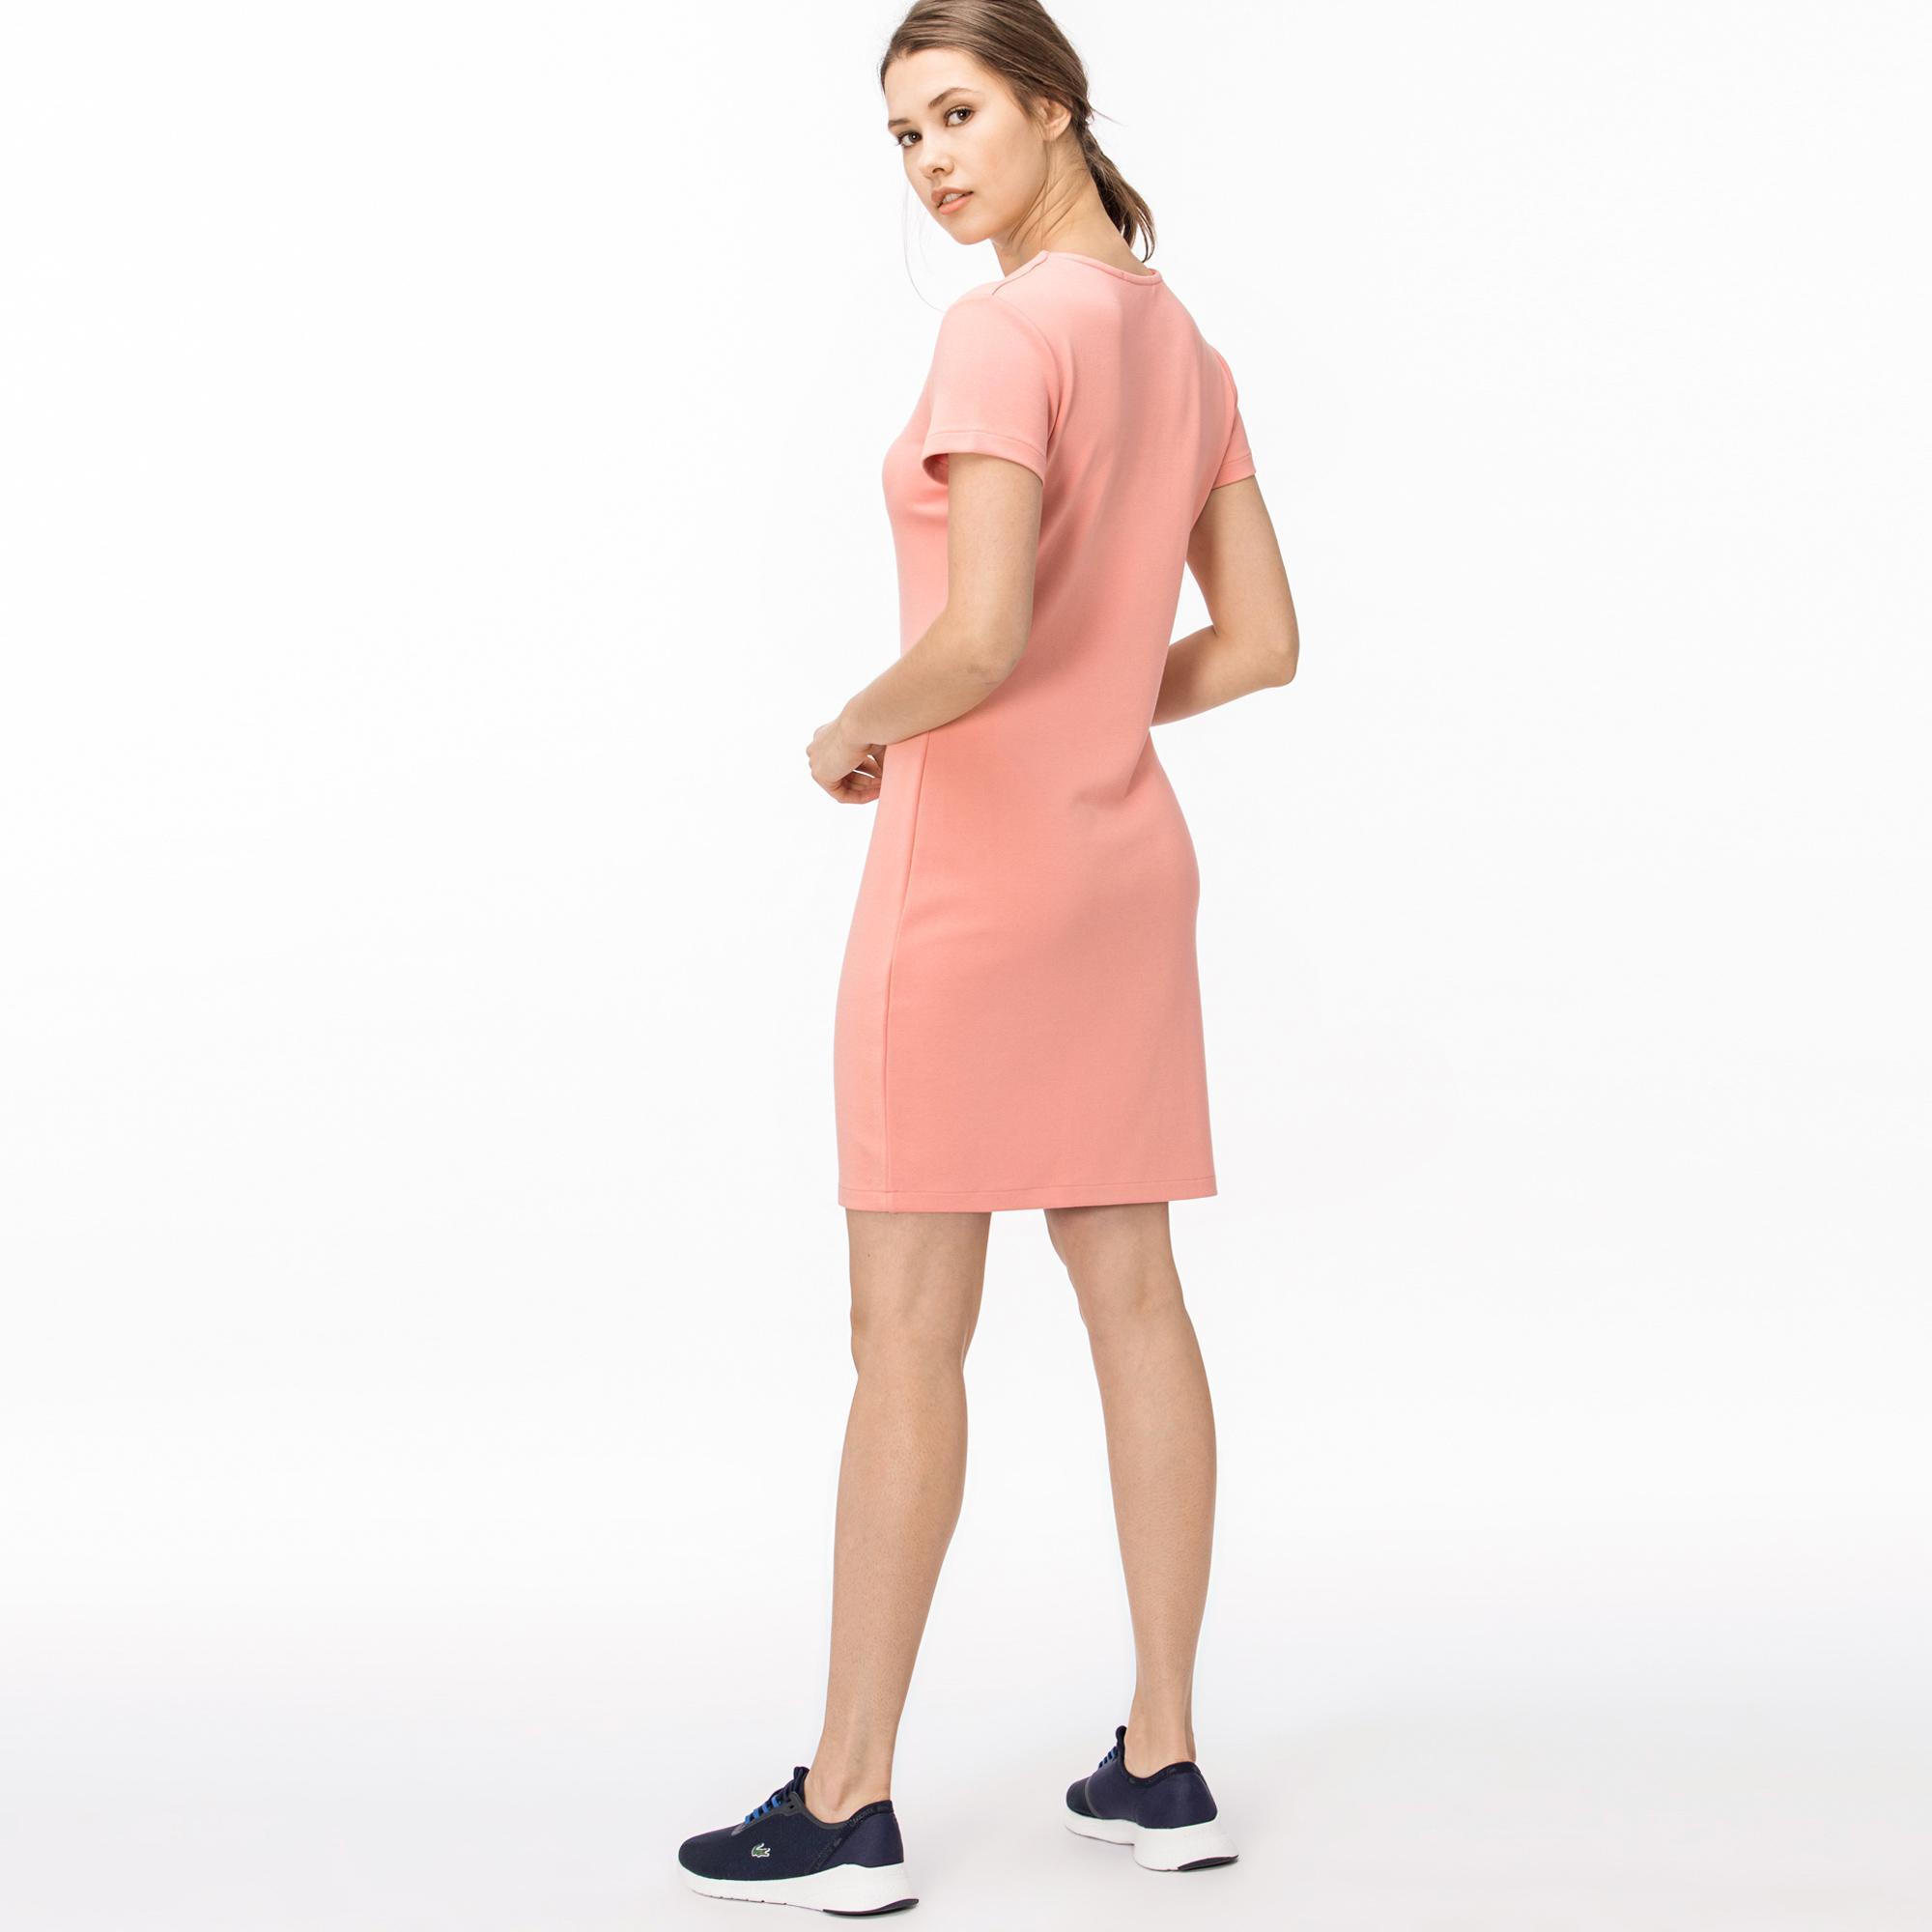 Lacoste Kadın V Yaka Pembe Elbise